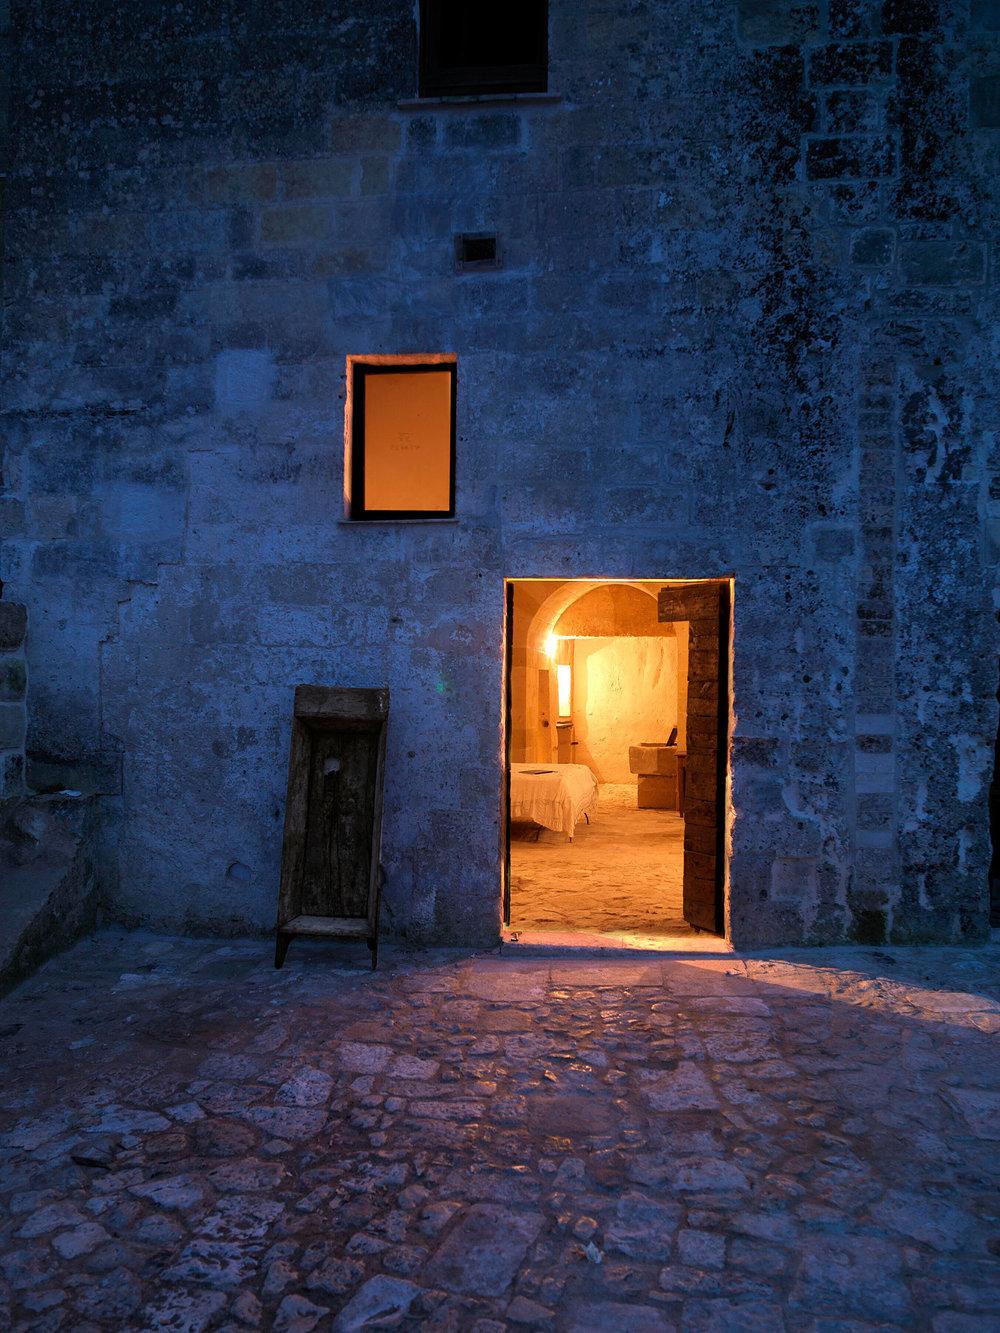 Contemporary Sanctuary: The Hotel at Sextantio Grotte della Civita in Matera on Perfect Local Day by UNCOVR Travel